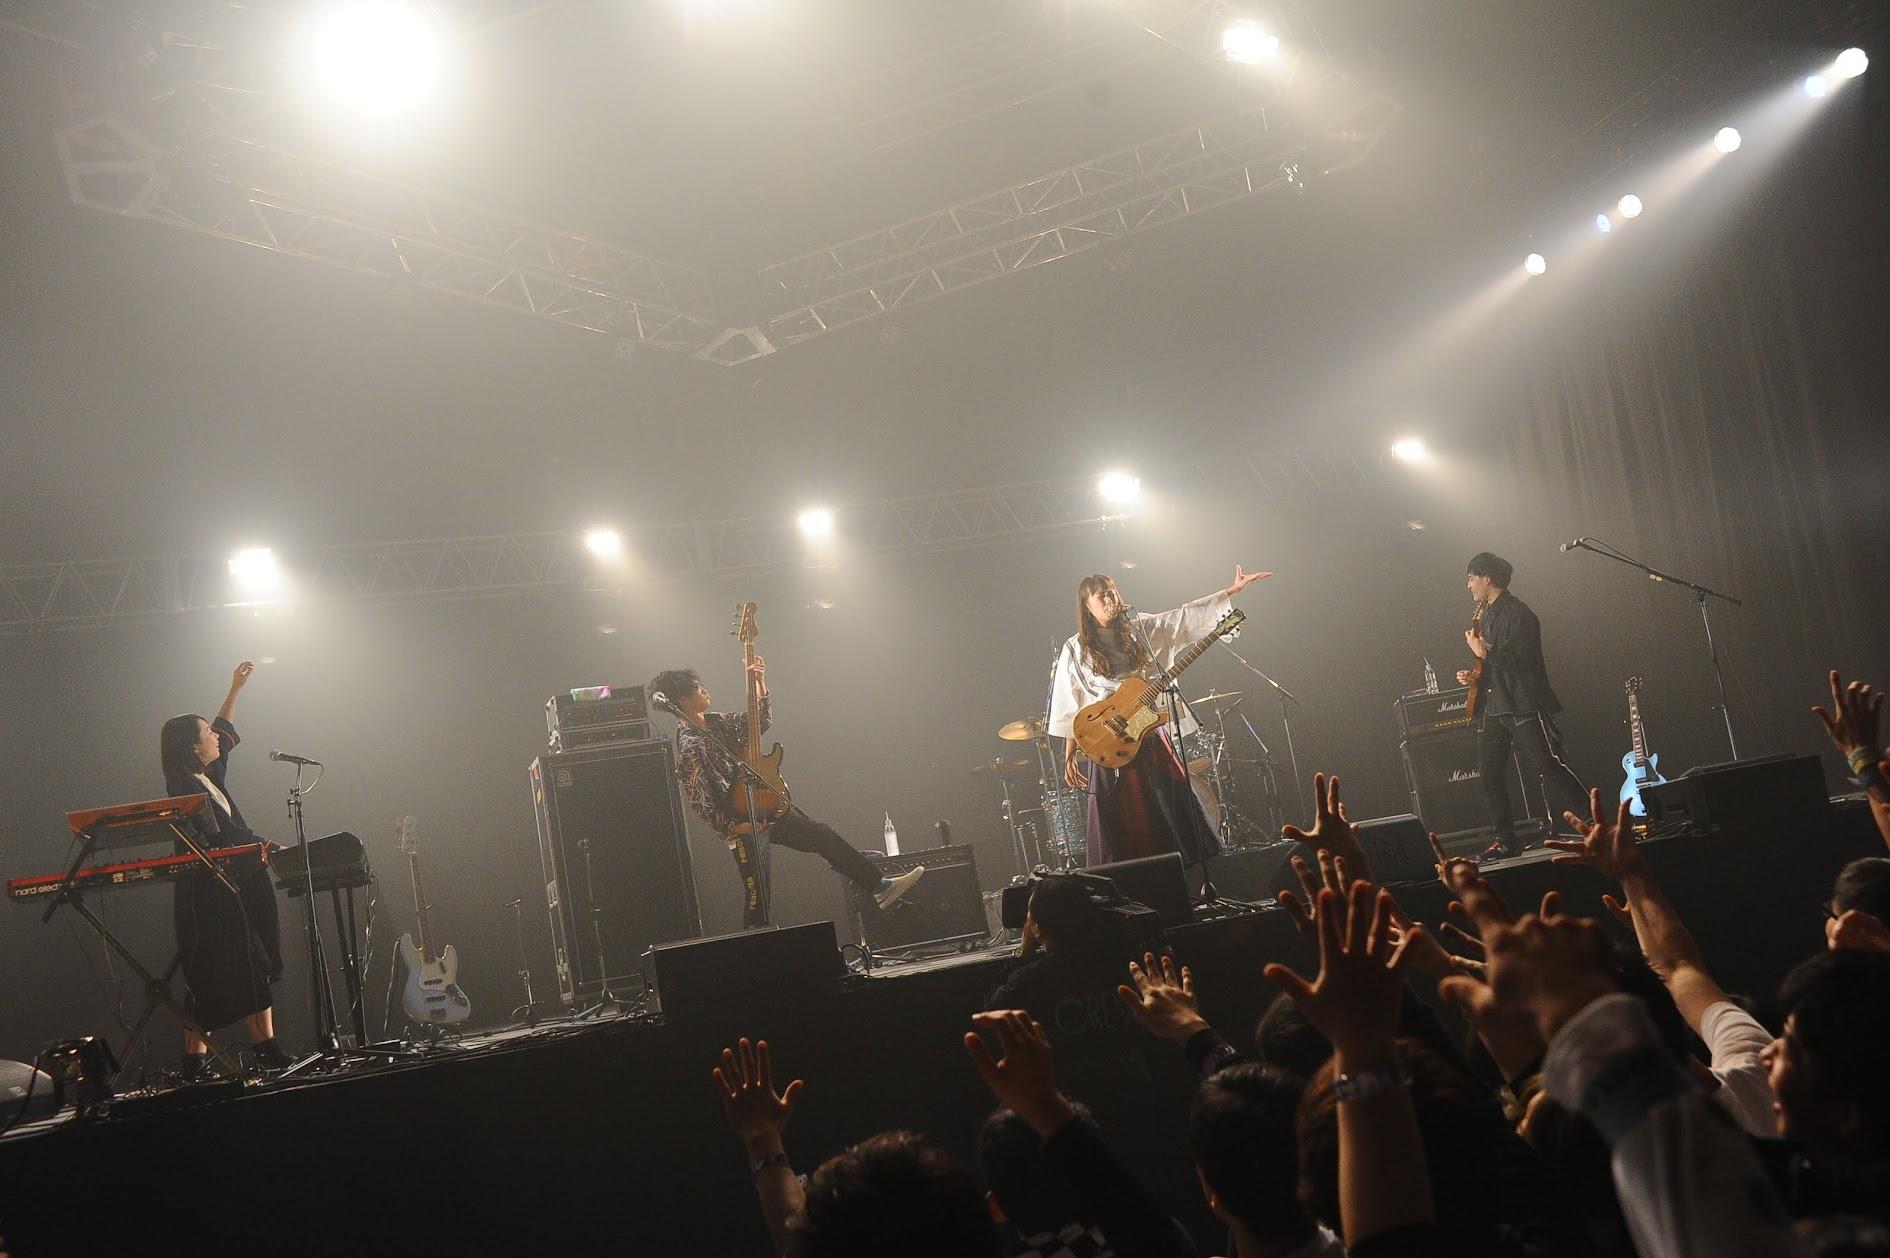 【迷迷現場】COUNTDOWN JAPAN 18/19 緑黄色社会 出演最終日ASTRO STAGE